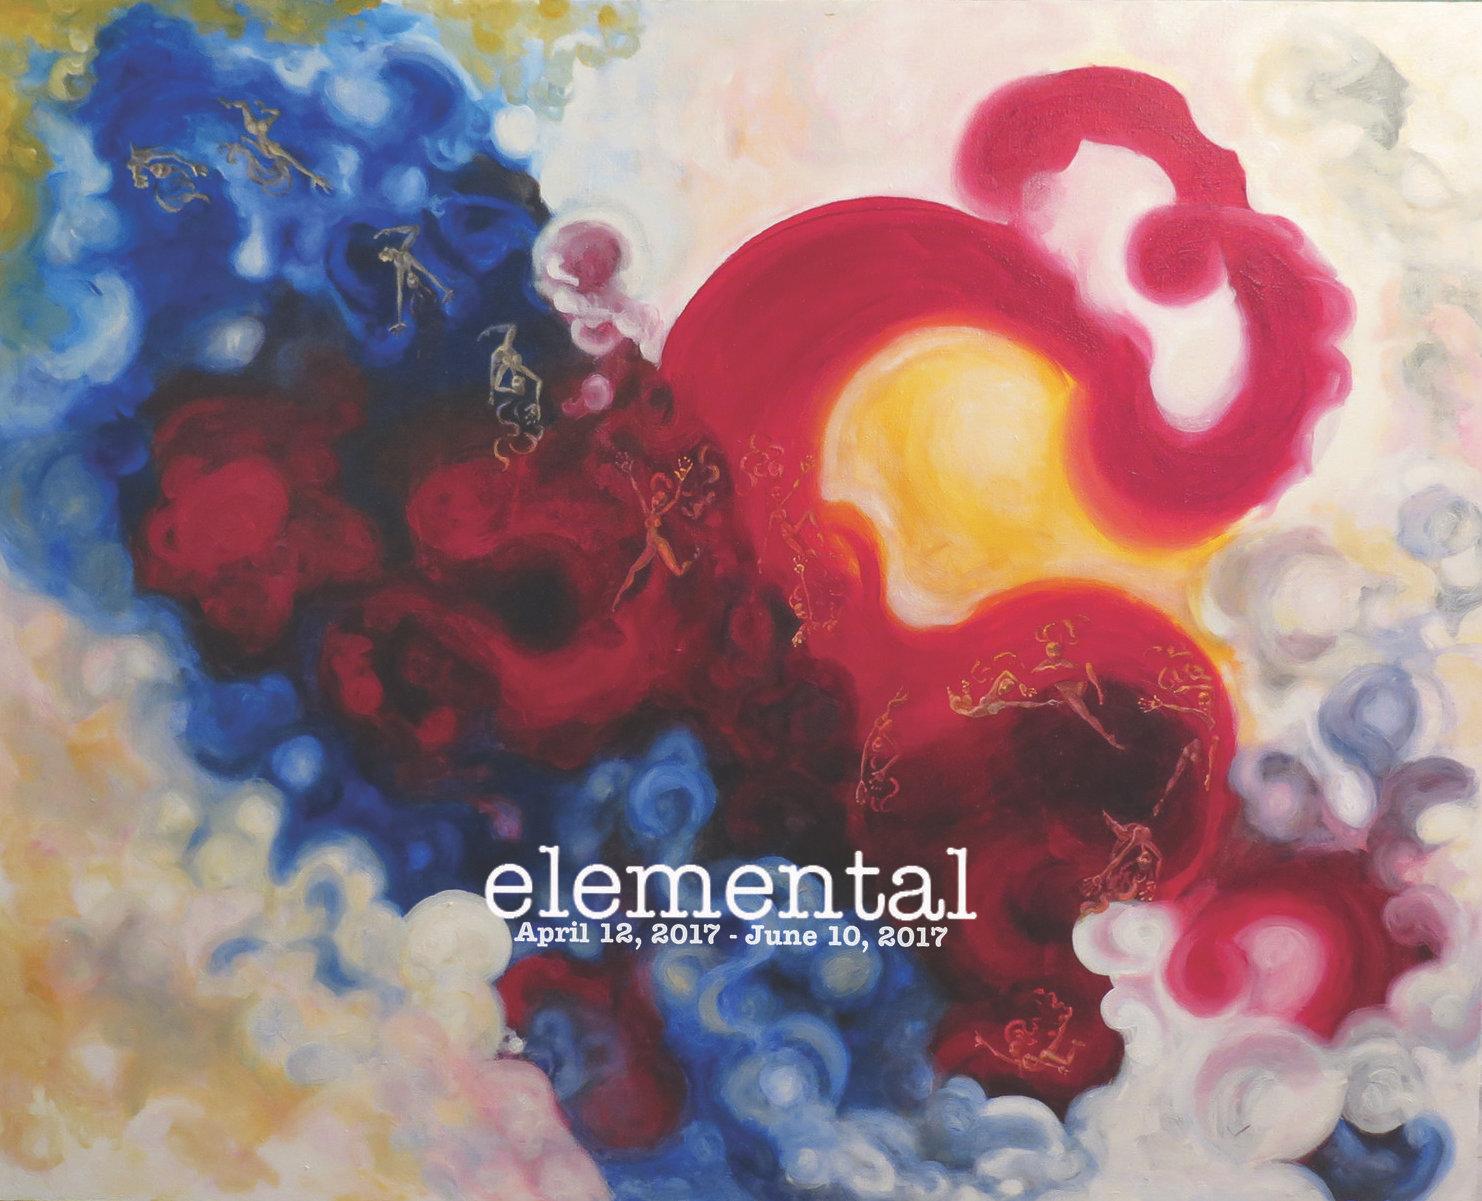 Elementalwebcover5.jpg